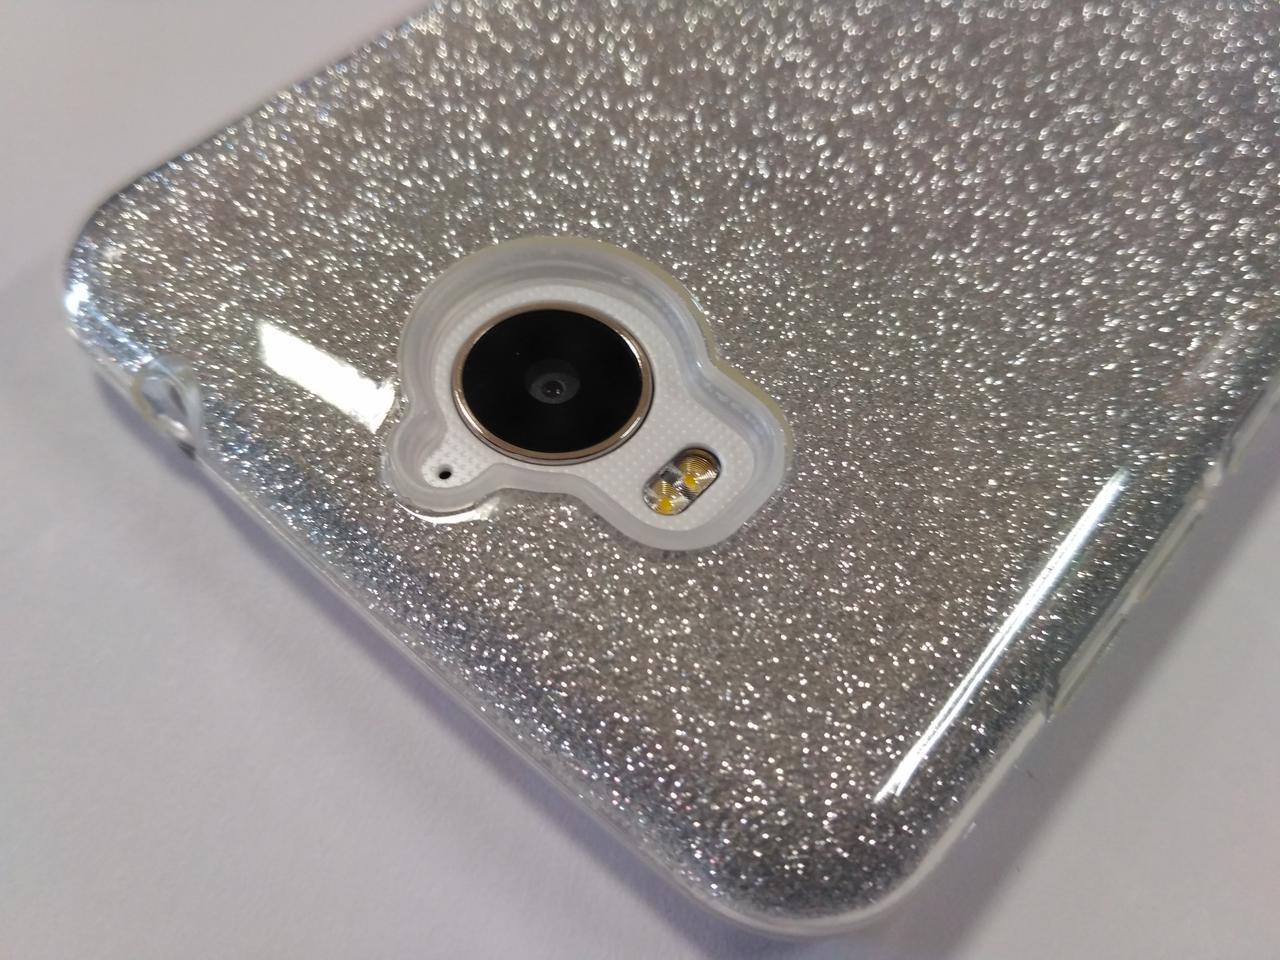 Чехол для смартфона Huawei Y5 2017 (U29) перелив серебристый